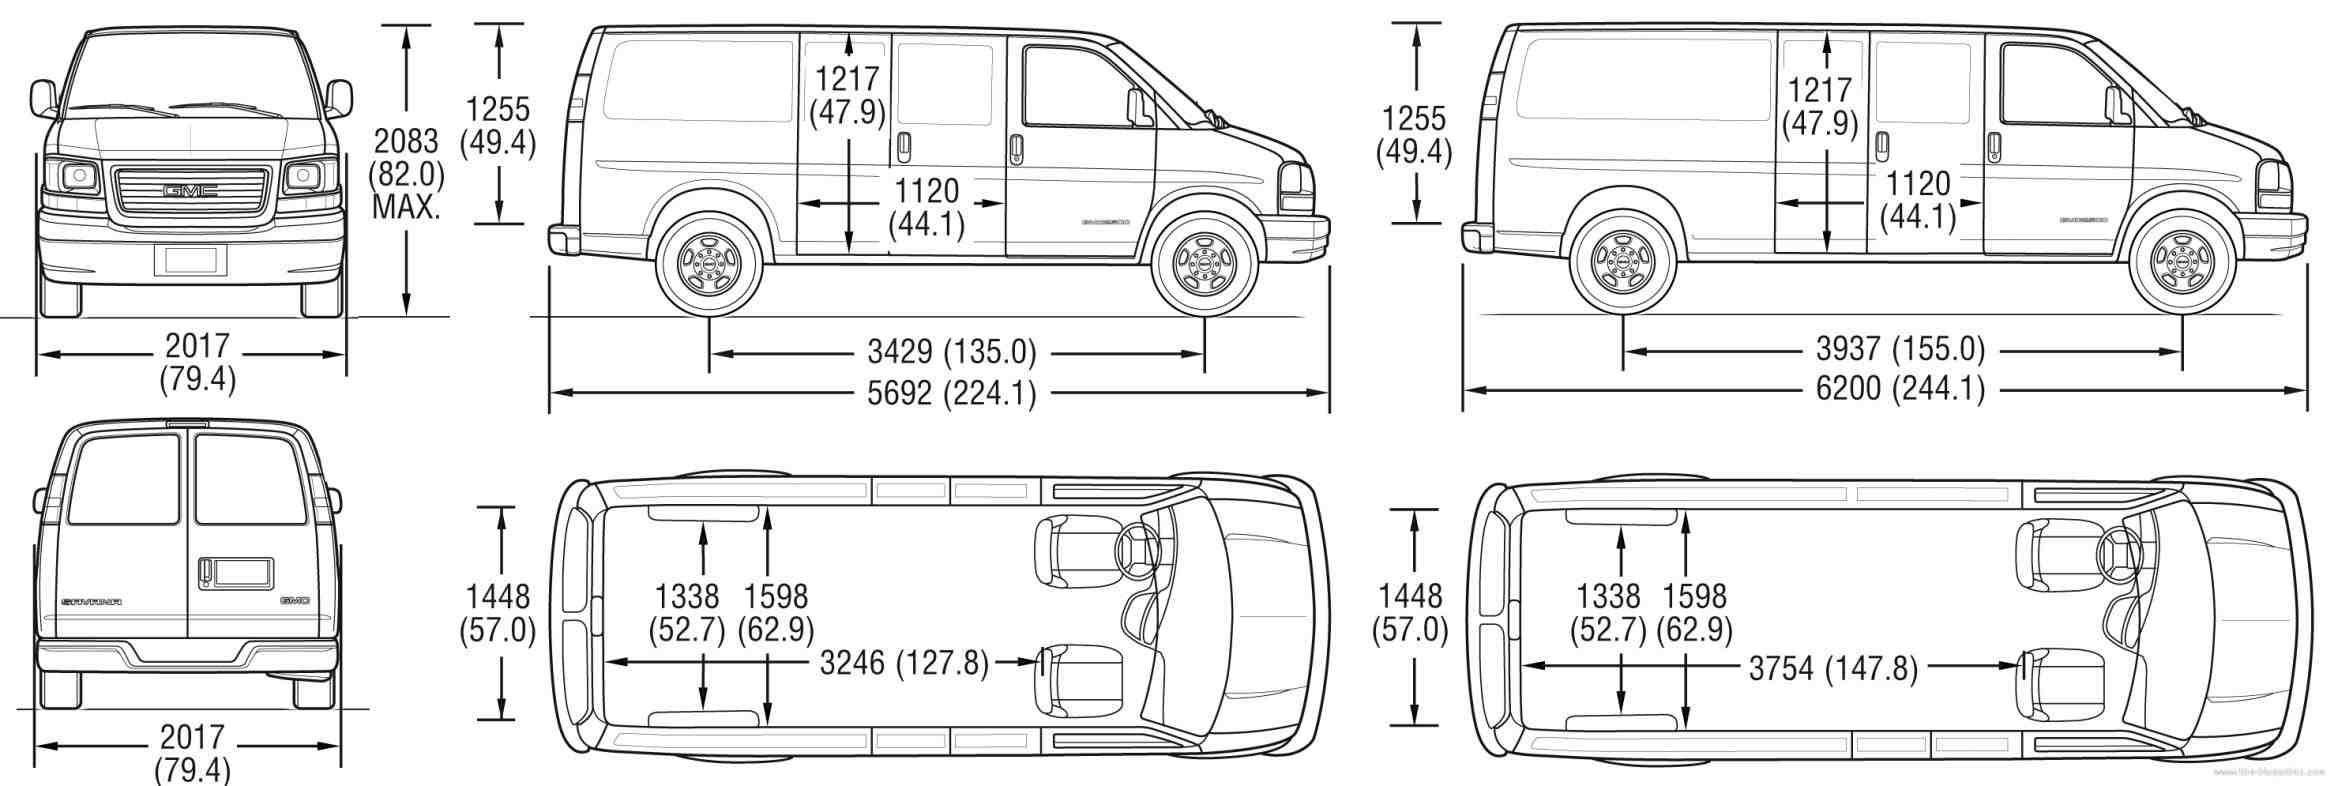 Astro Gmc Safari Interior Dimensions Van For To Camper Conversion Information And Photos Zombiedrive